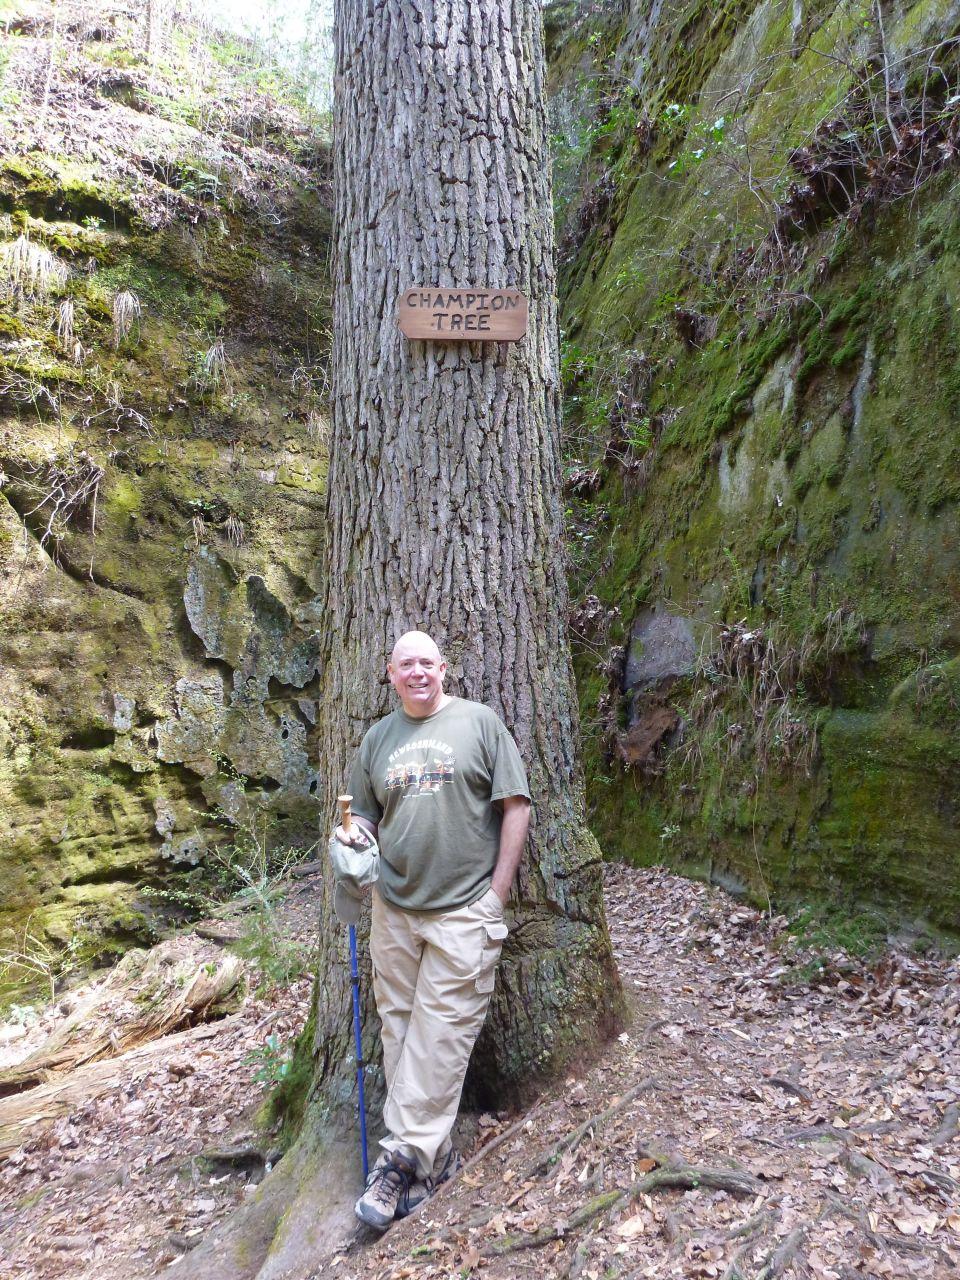 David And The Champion Tree